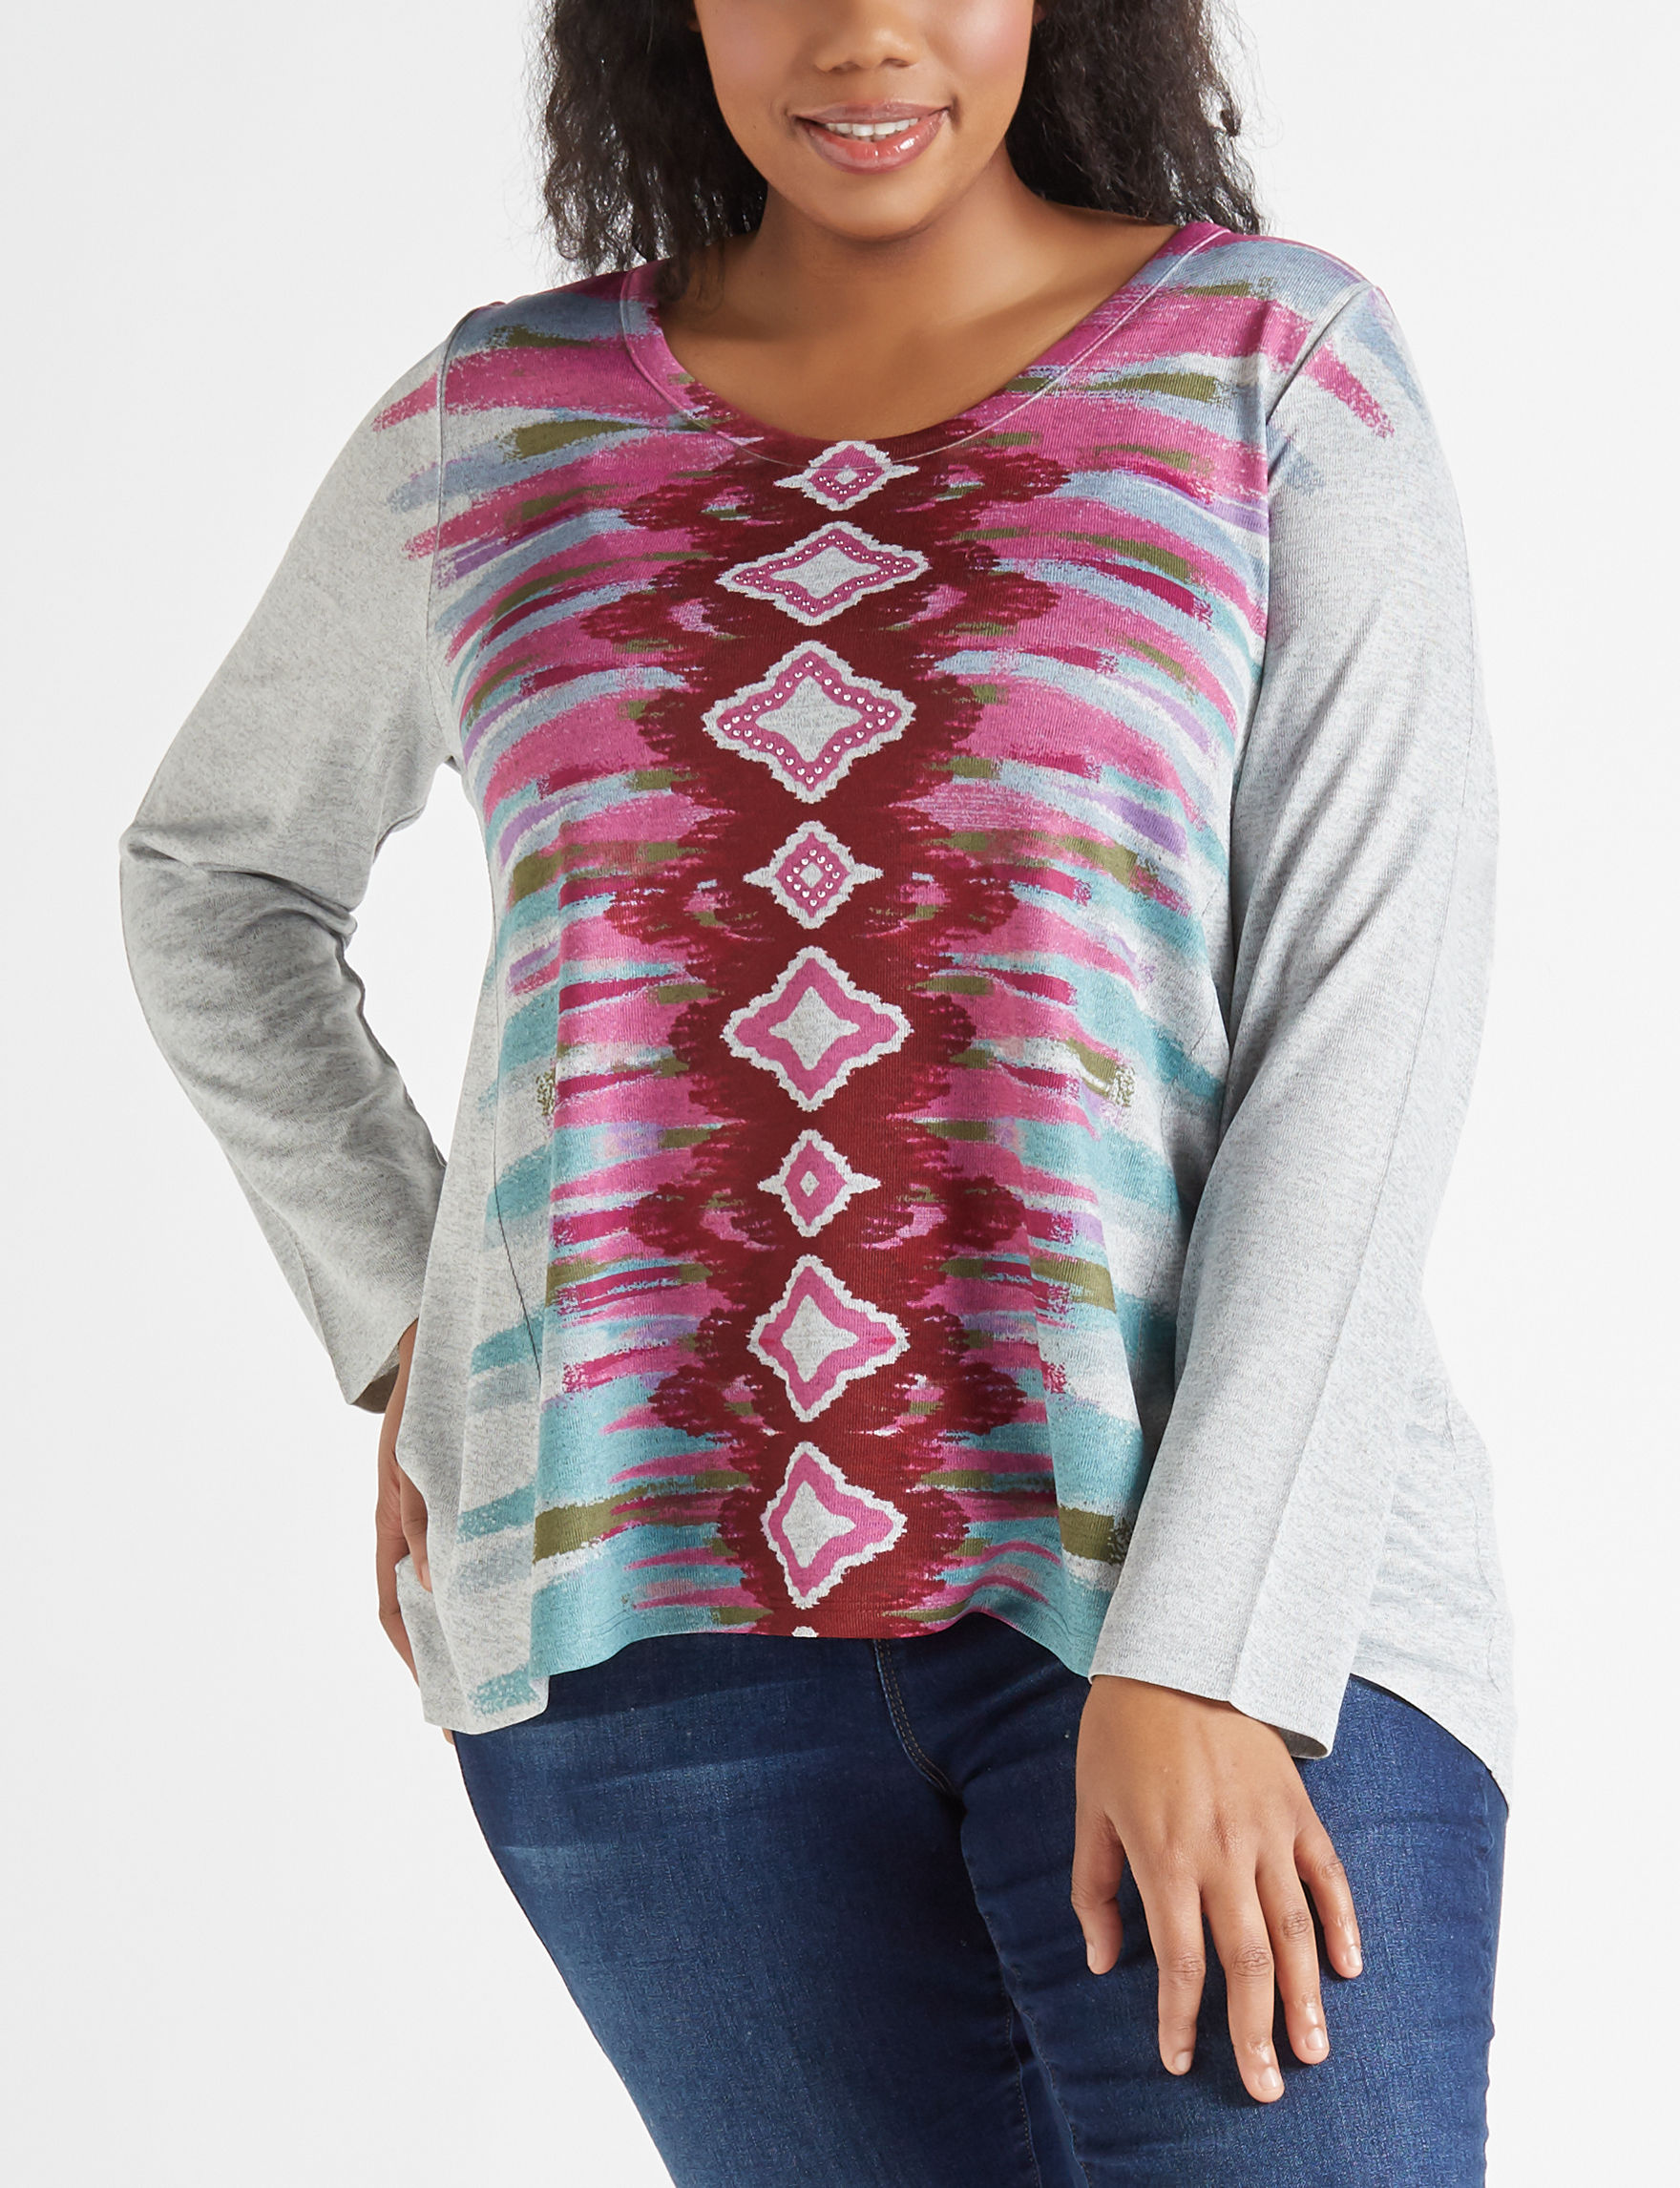 Latitude 10 Grey / Pink Shirts & Blouses